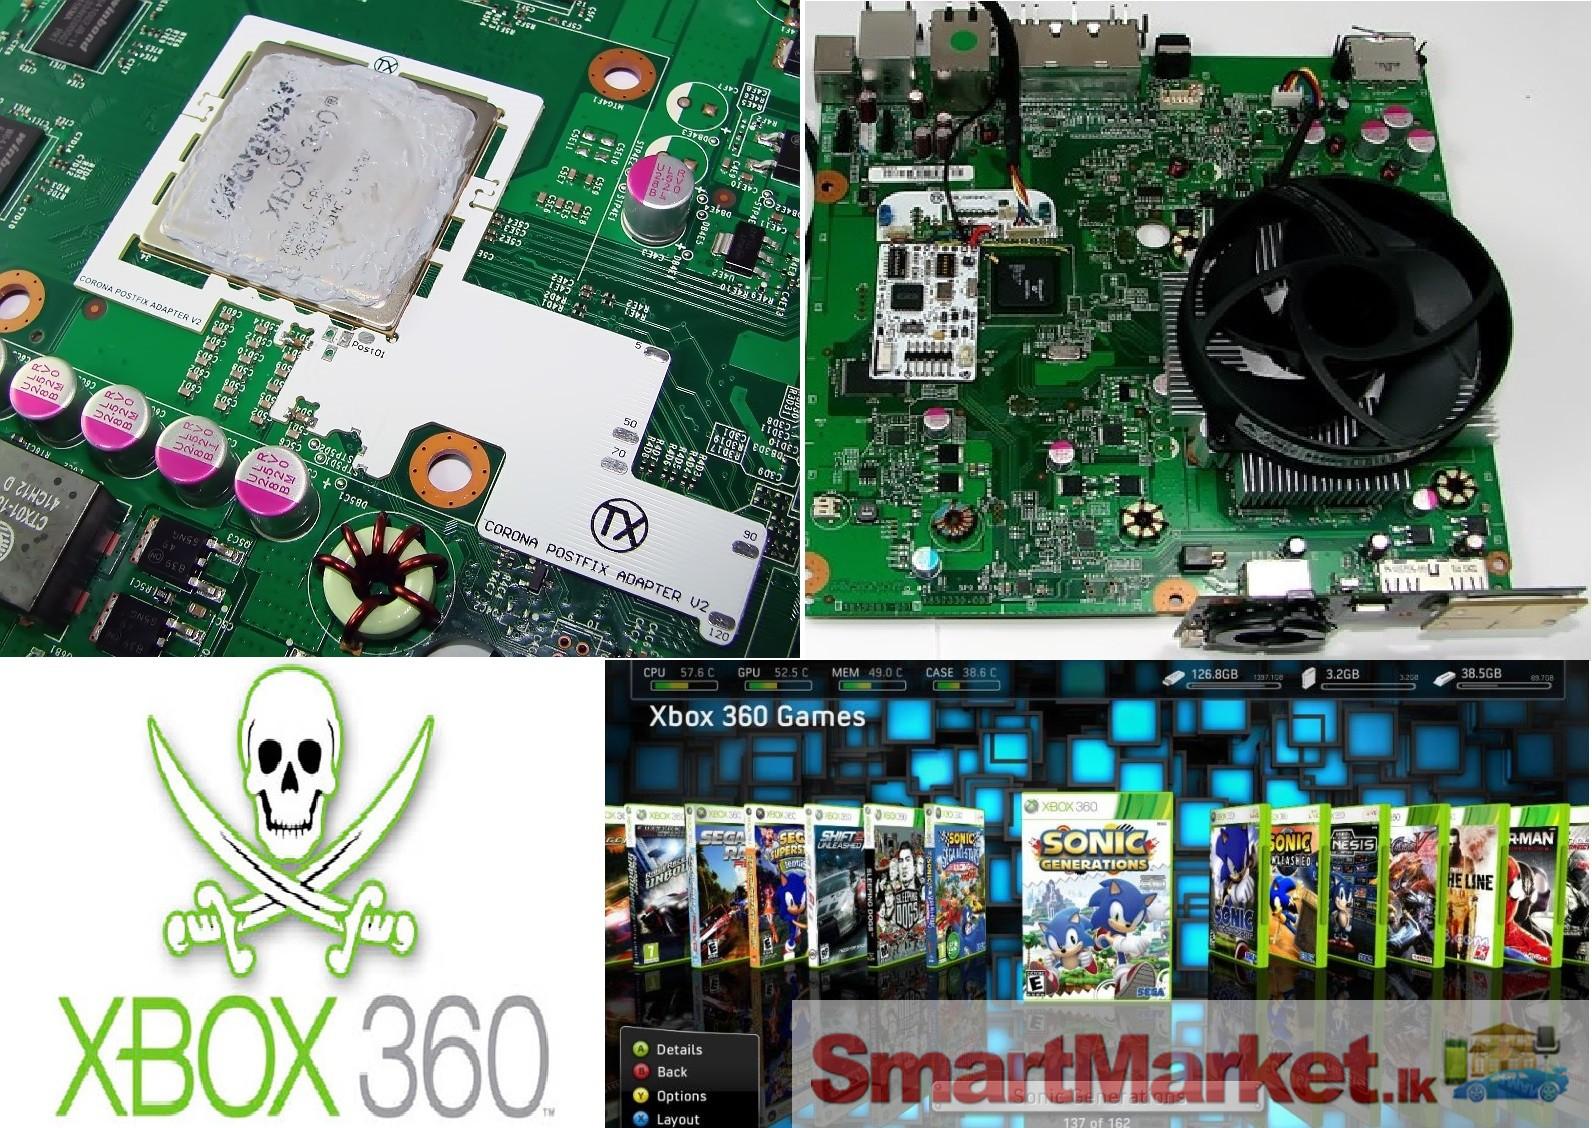 XBOX 360 MOD & REPAIR JTAG,RGH2,LTU2